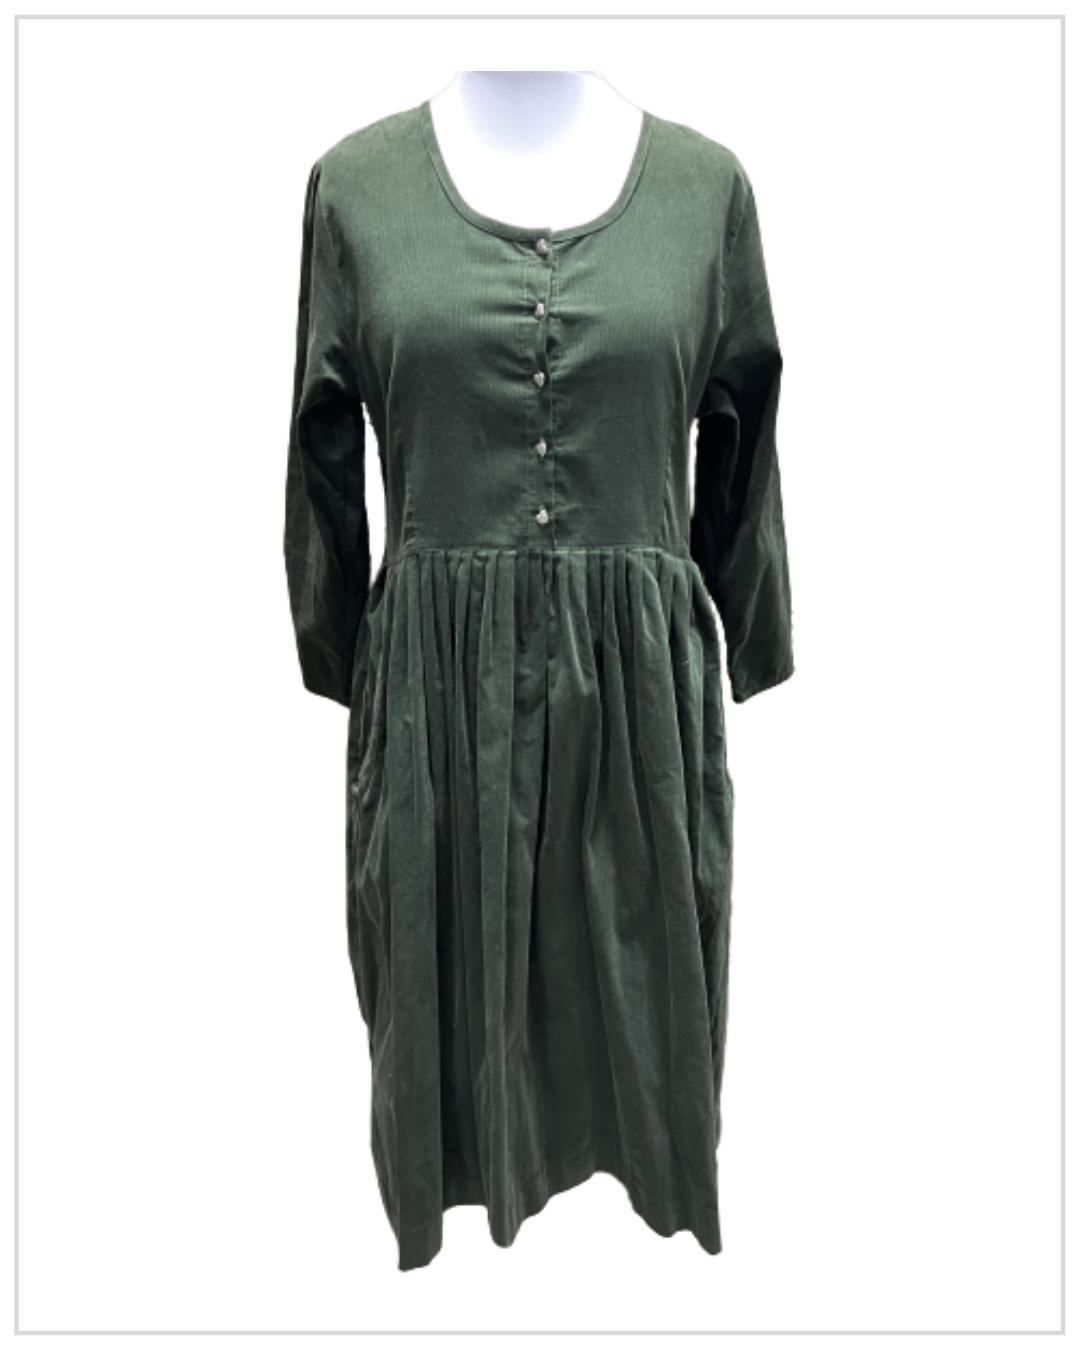 SHTAPEL velvetinė suknelė Natali 11721